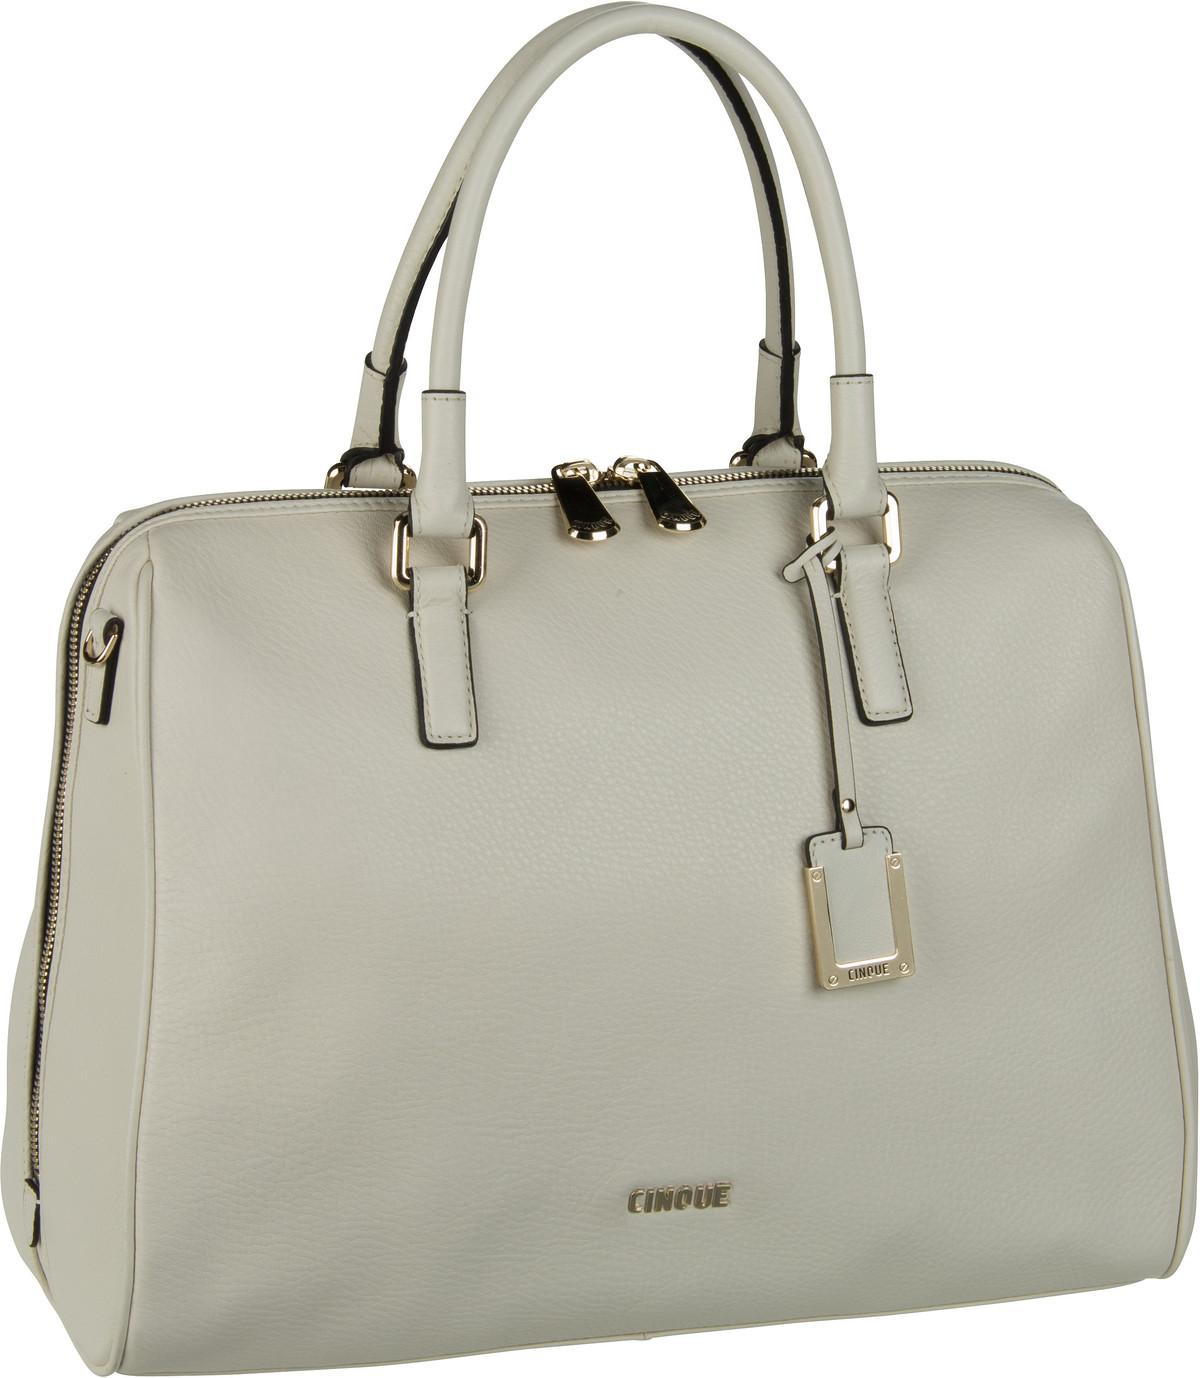 Cinque Handtasche Roberta 11828 Offwhite